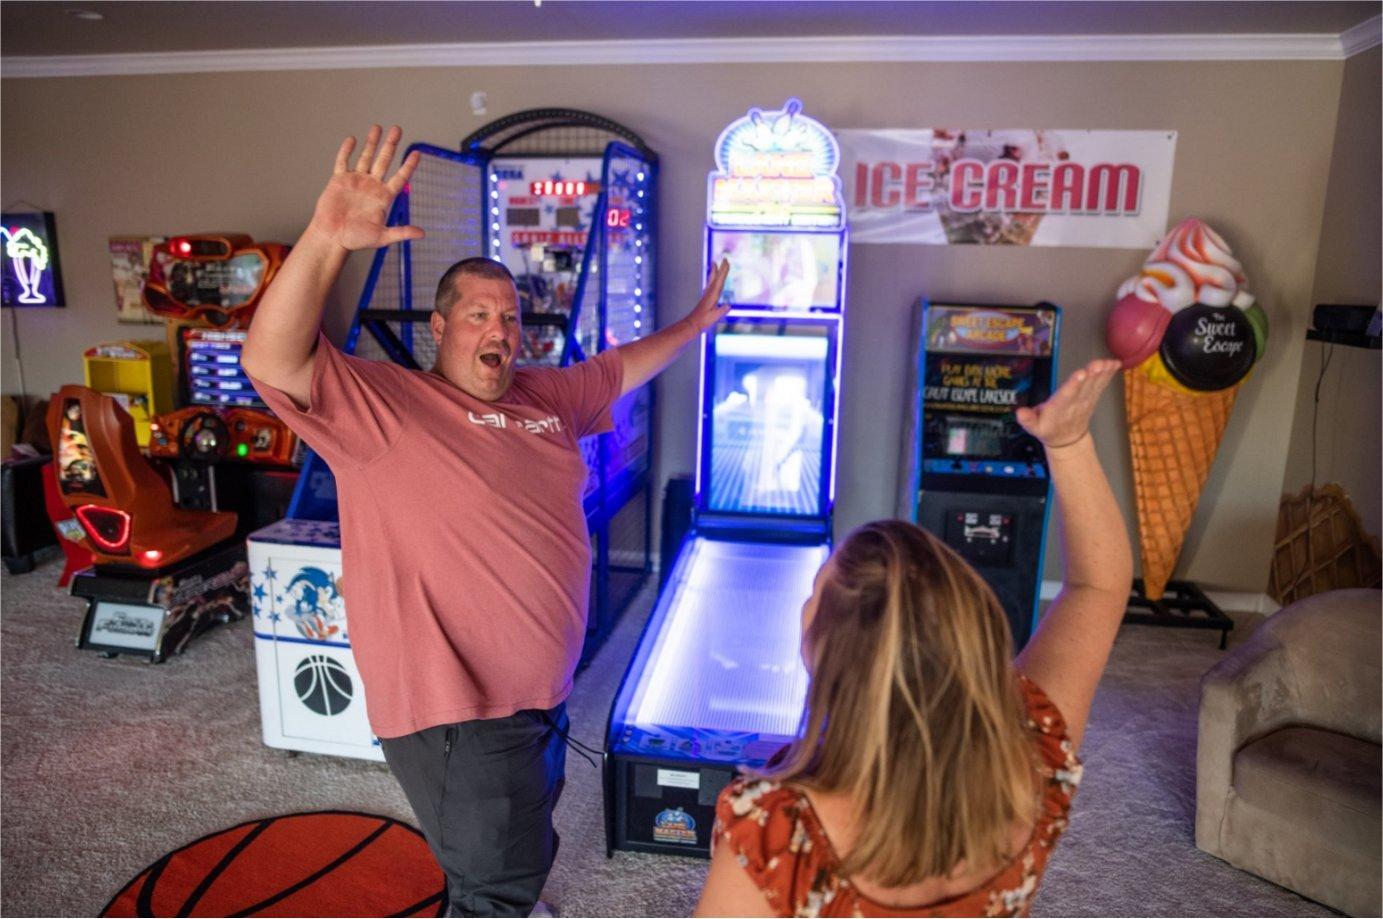 Video game arcade at The Sweet Escape vacation home rental near Orlando, Florida